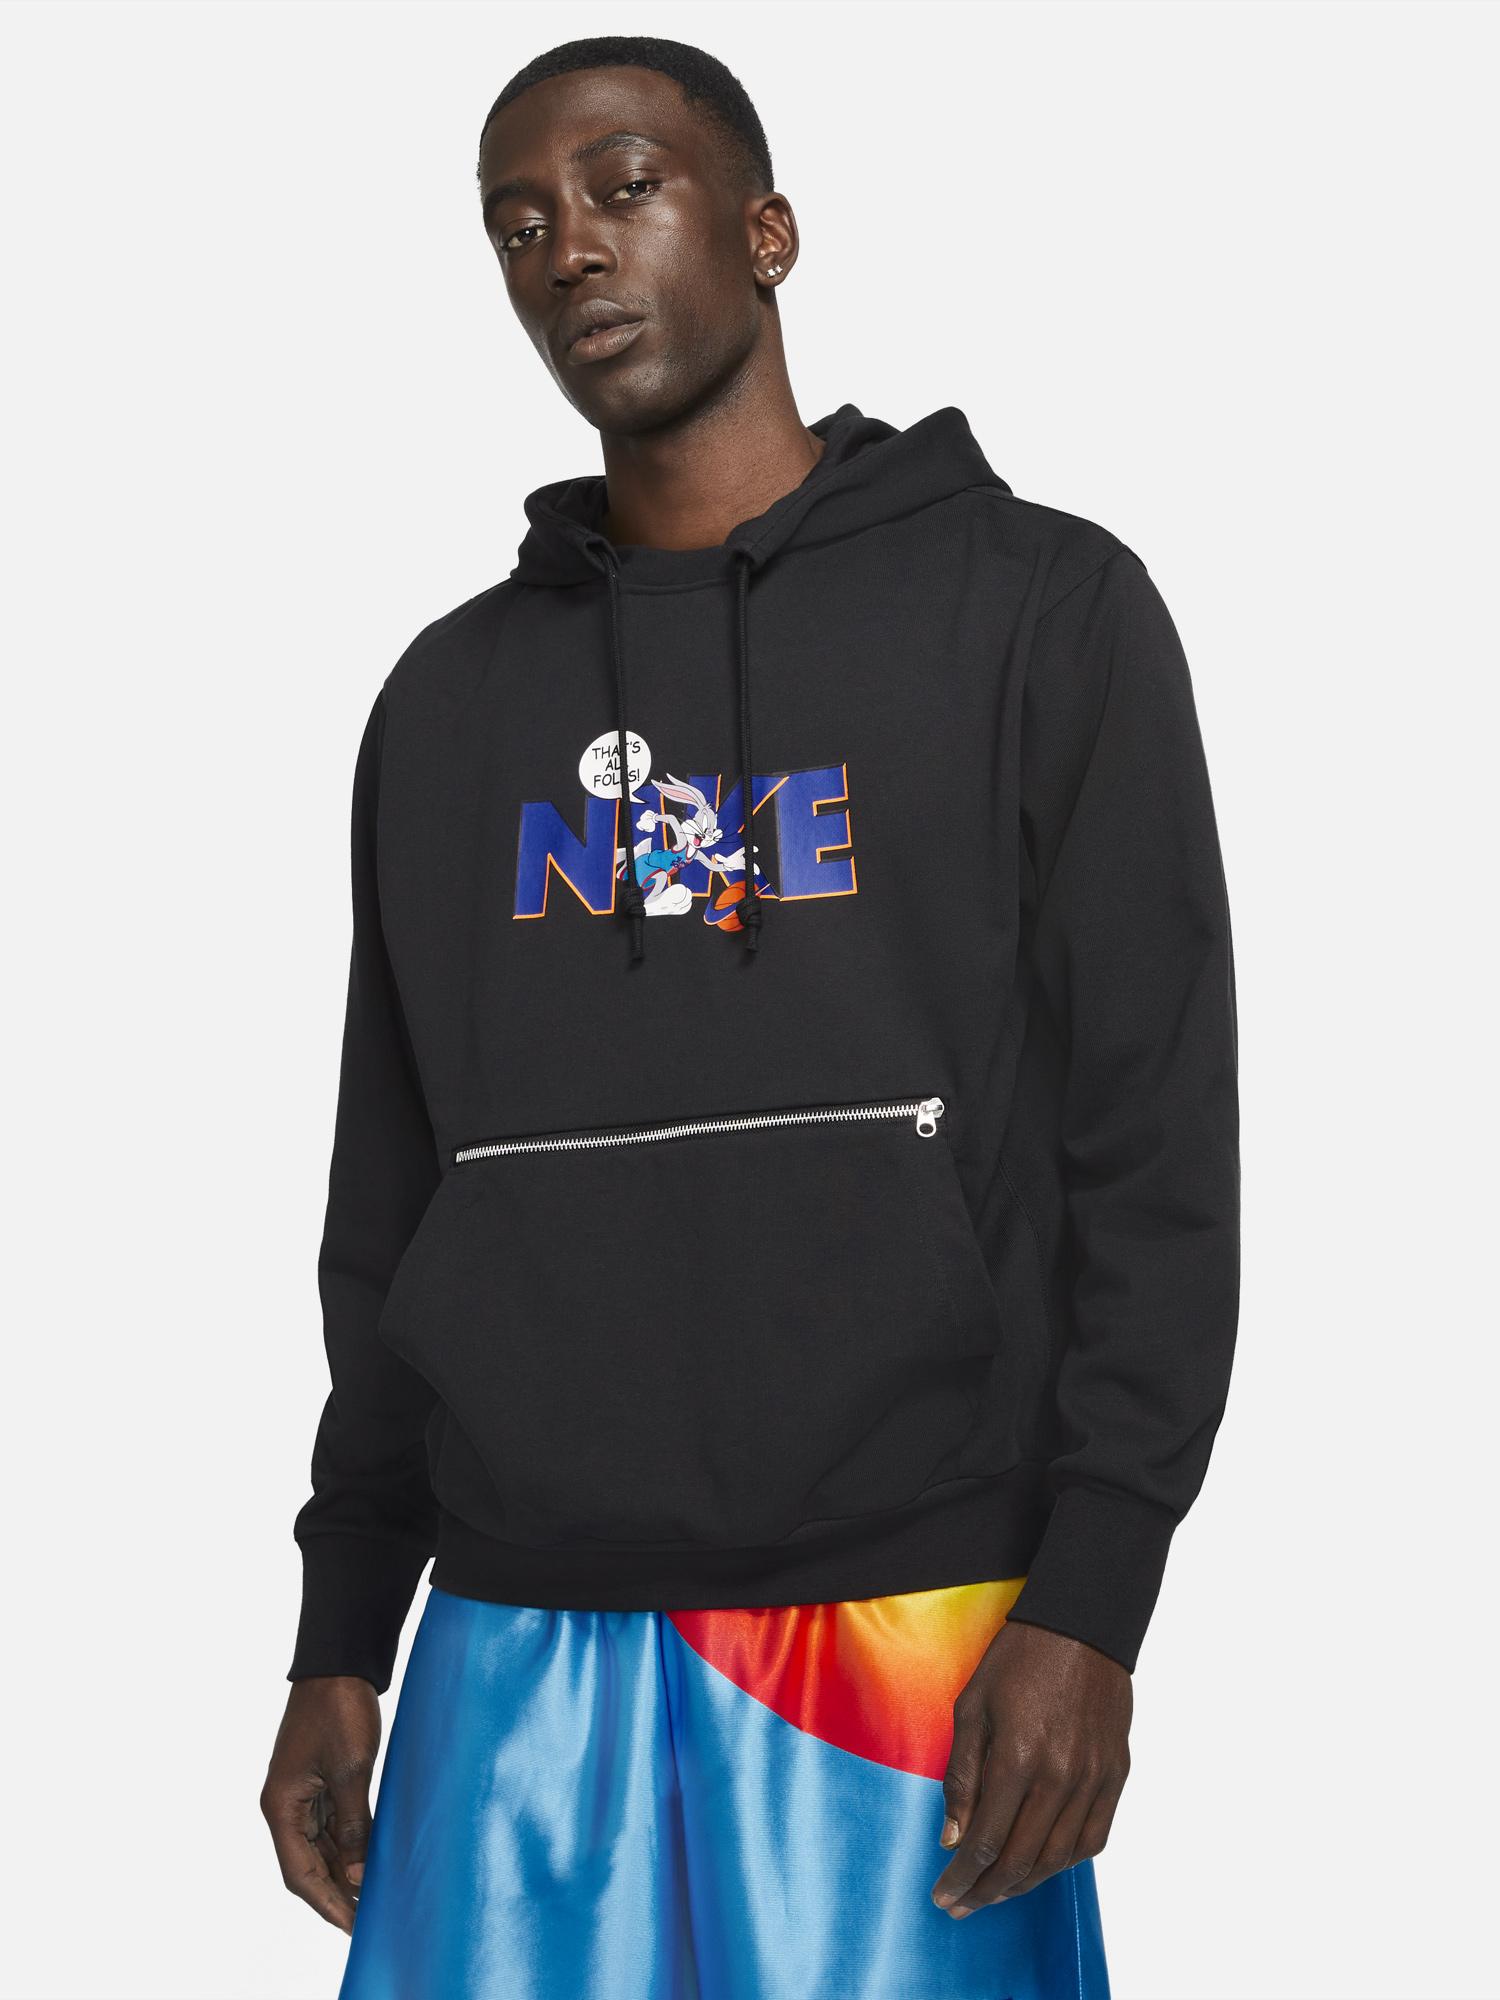 nike-space-jam-new-legacy-tune-squad-black-hoodie-1